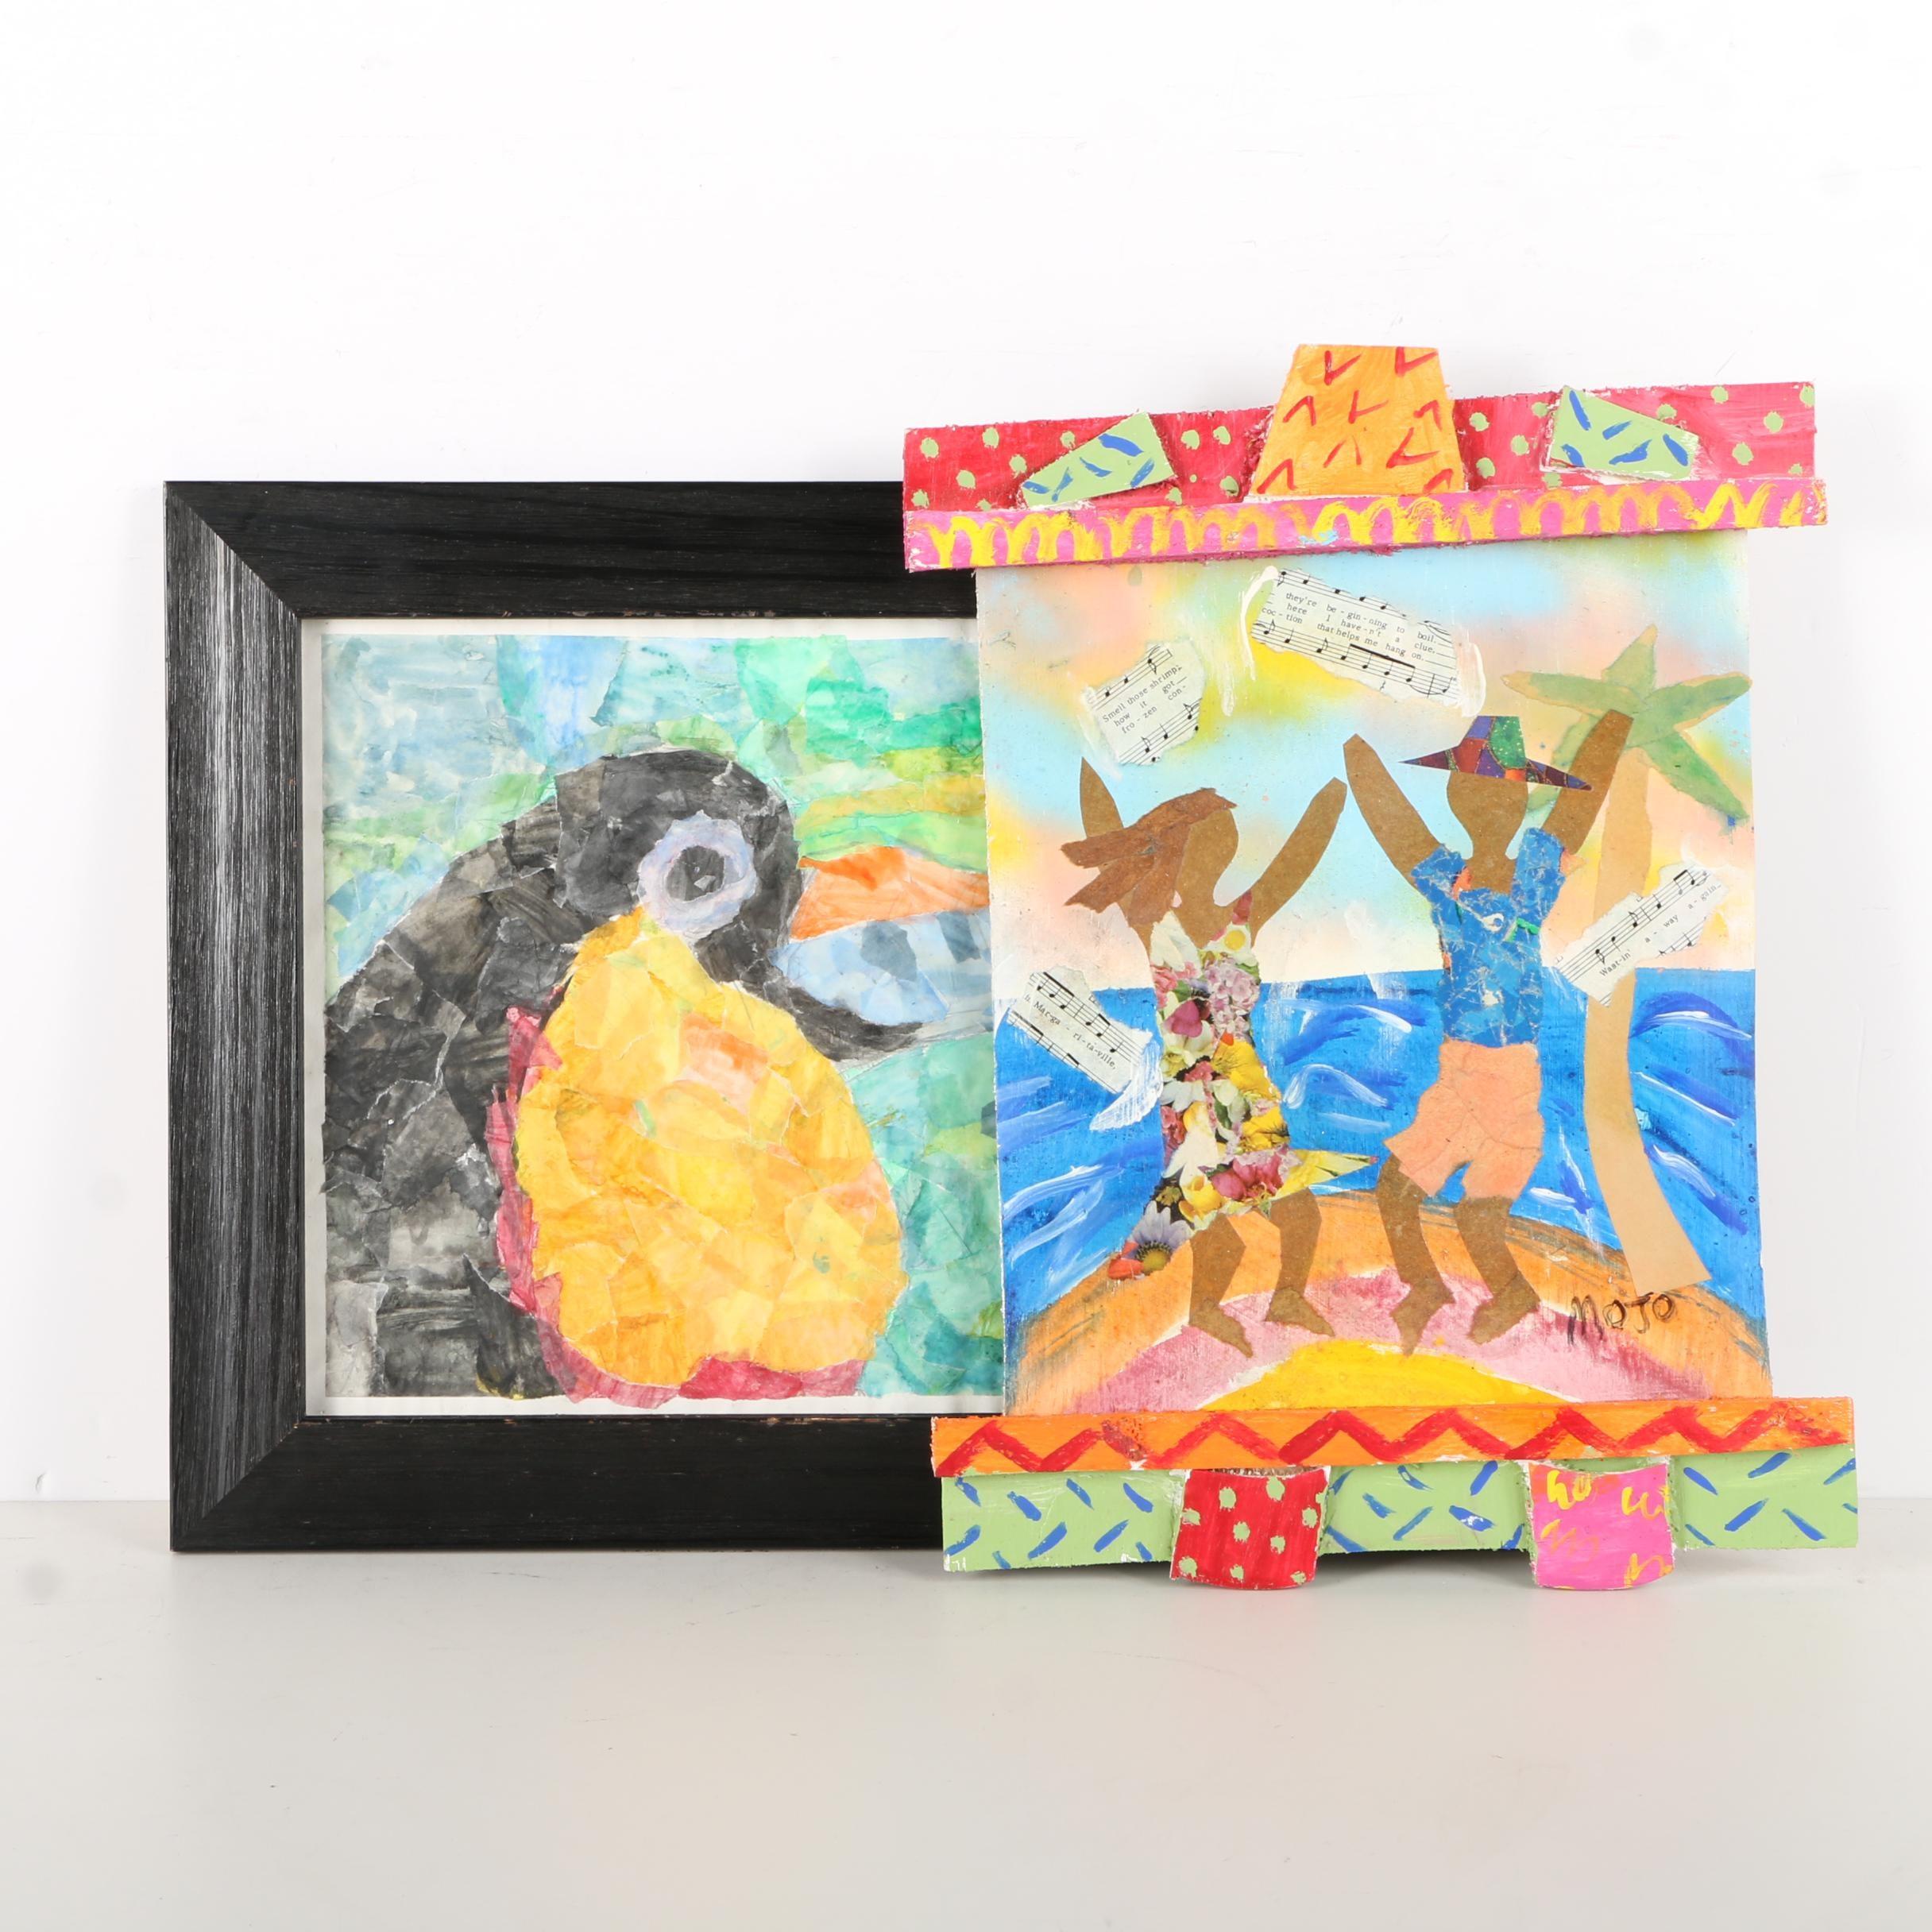 Megan McCord and Morris Johnson Mixed Media Paintings of Tropical Scenes